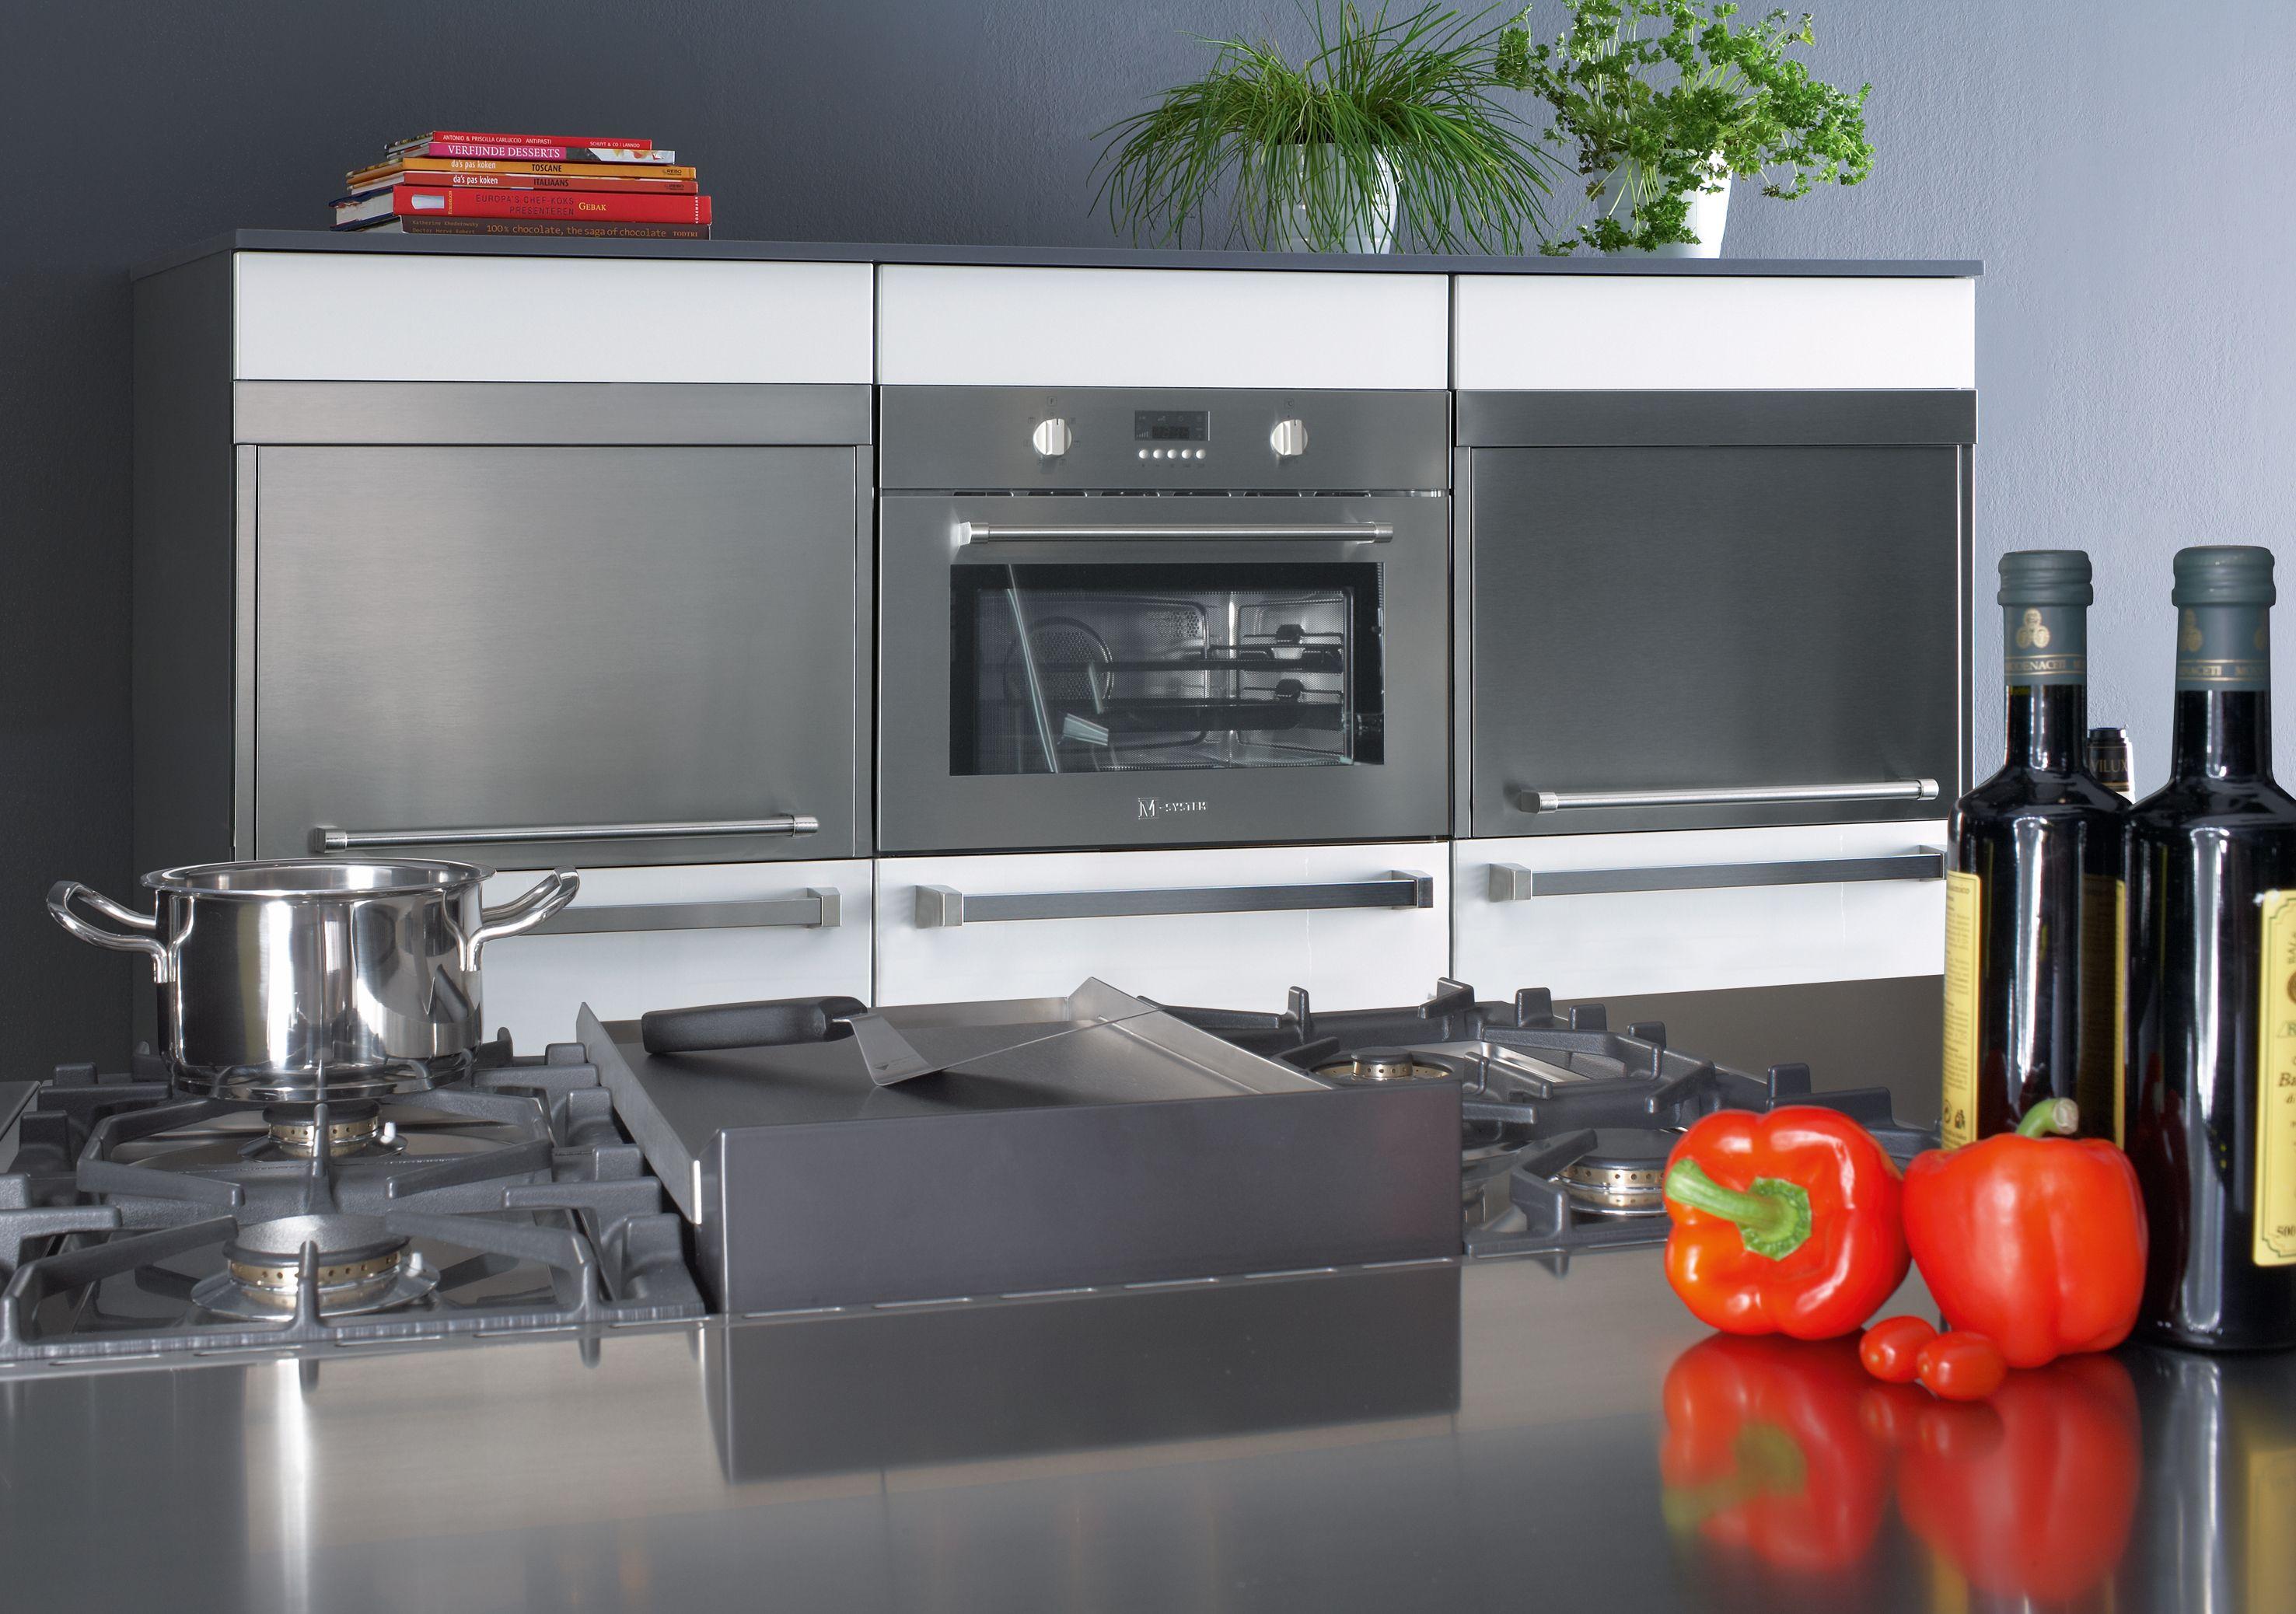 M system made by boretti fabrieksinformatie m system